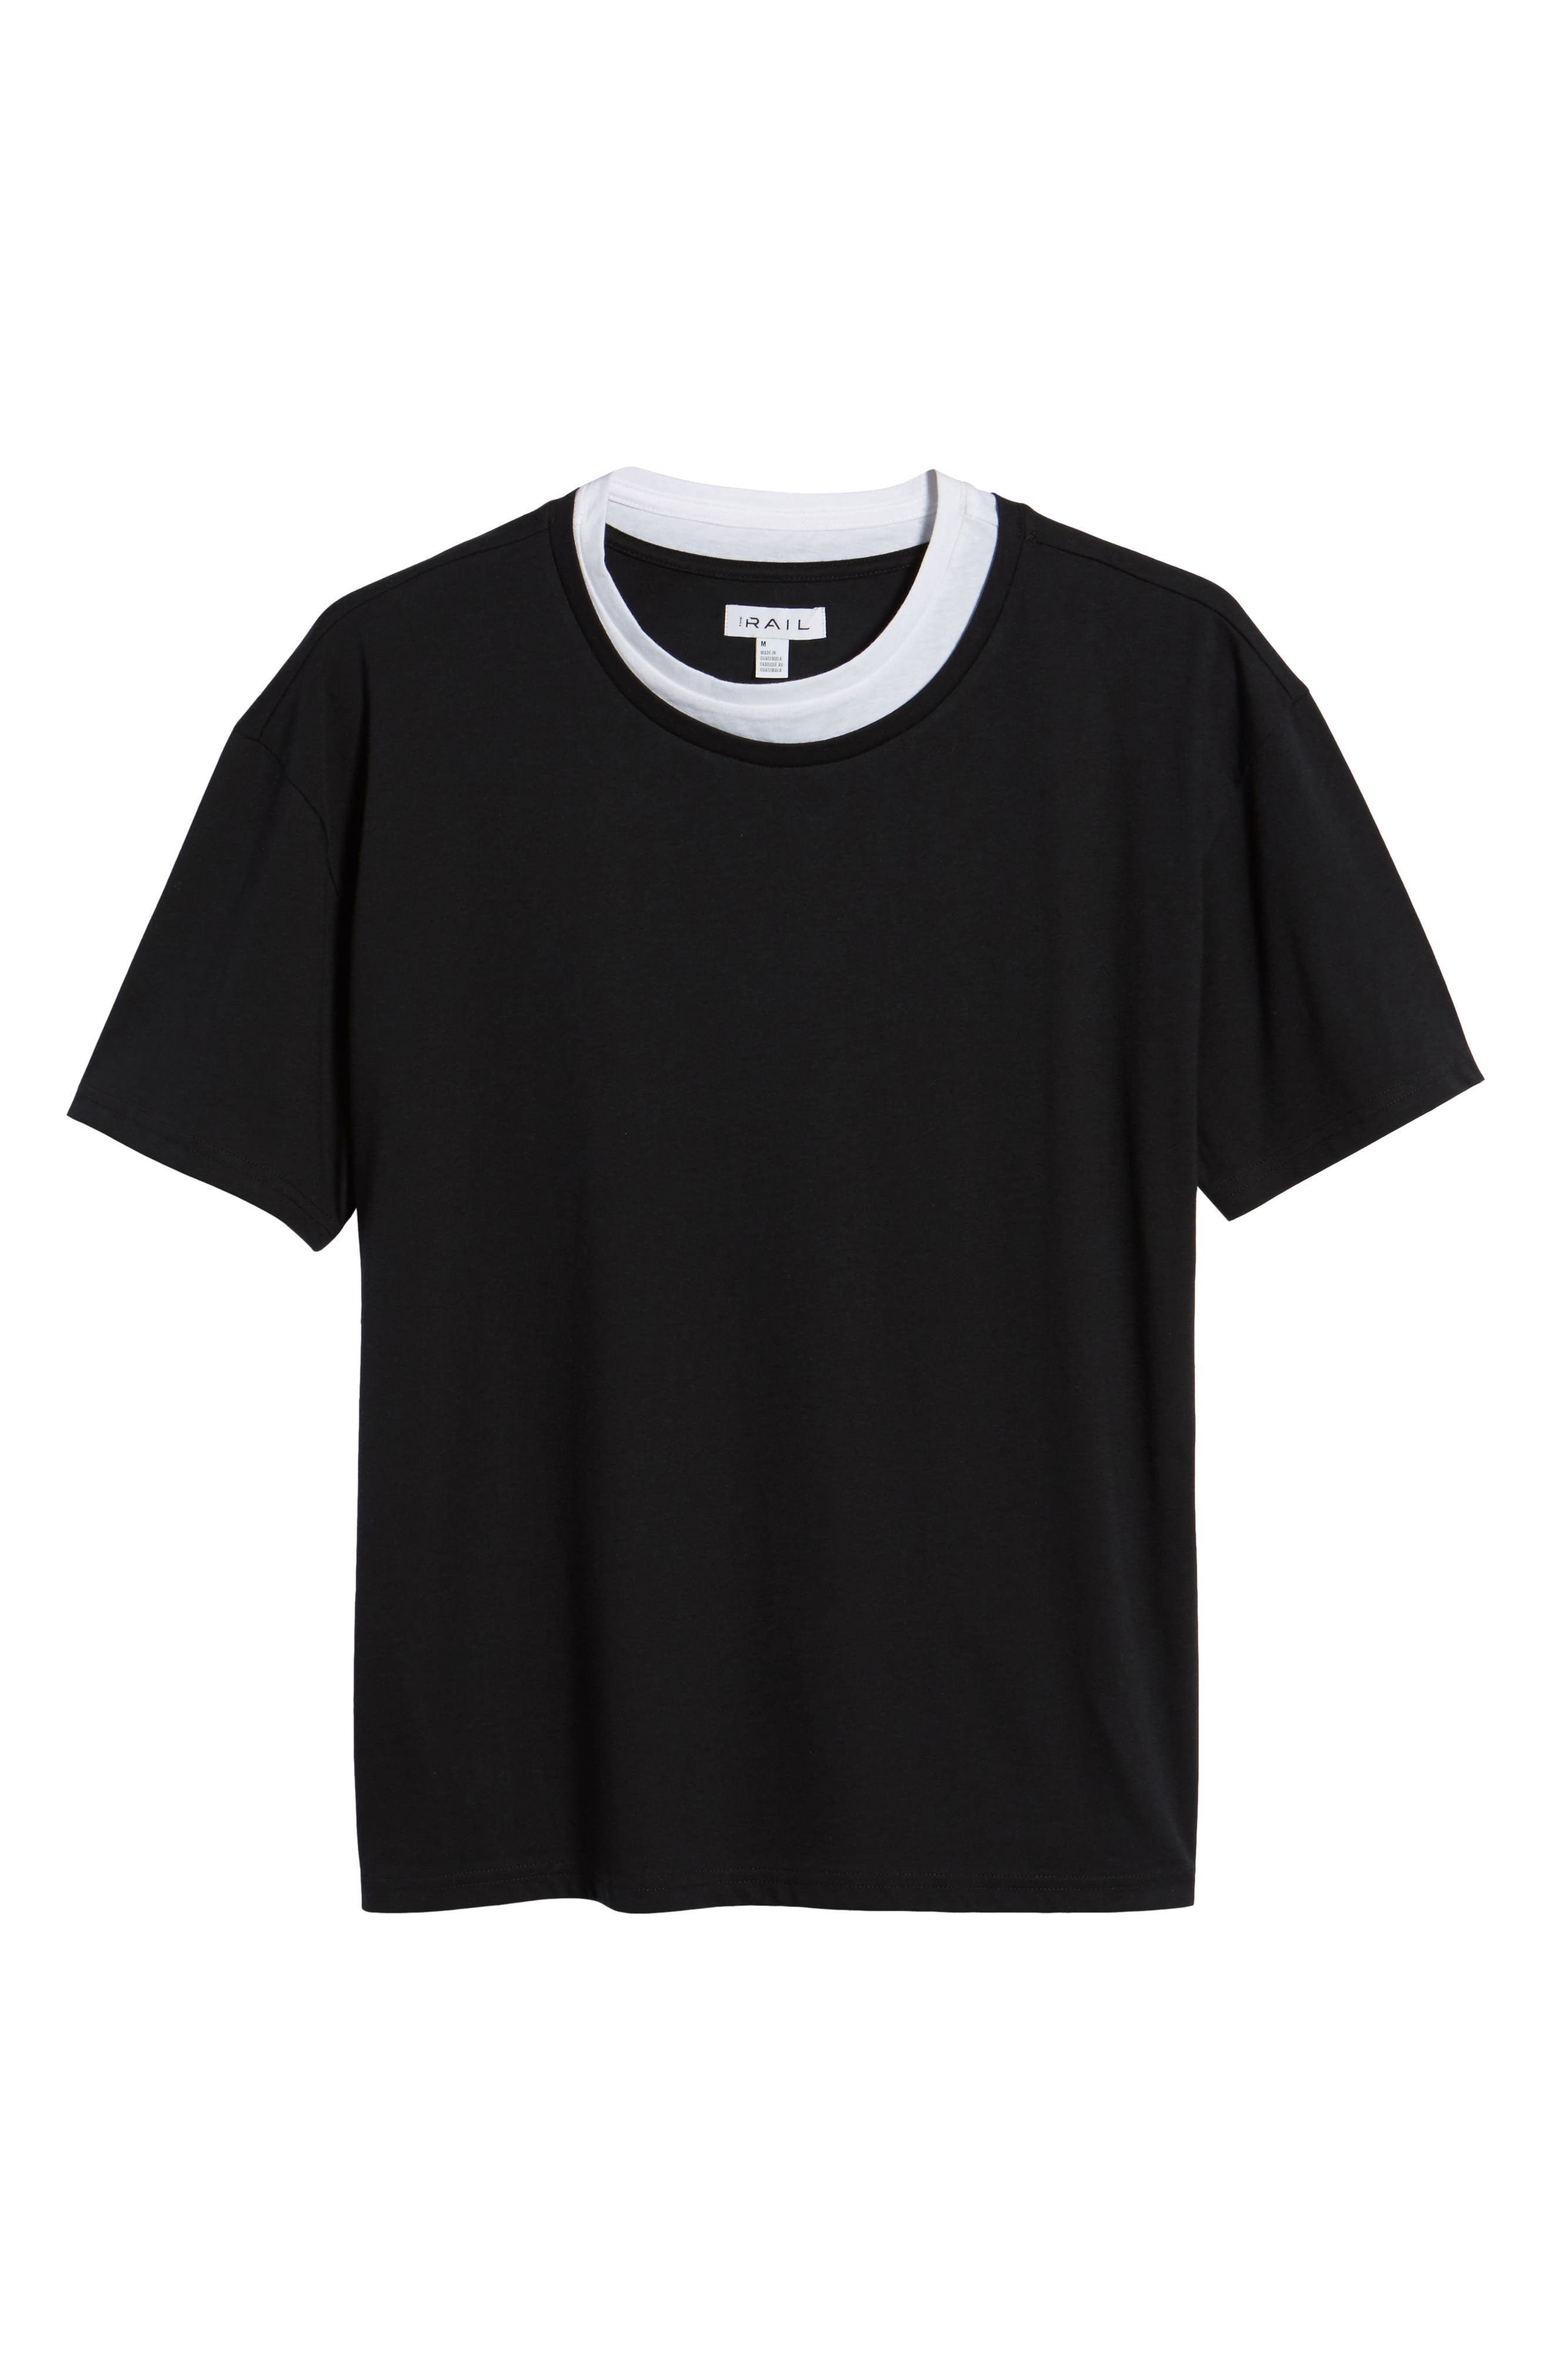 Double Layer T-Shirt,                             Alternate thumbnail 6, color,                             Black/ White